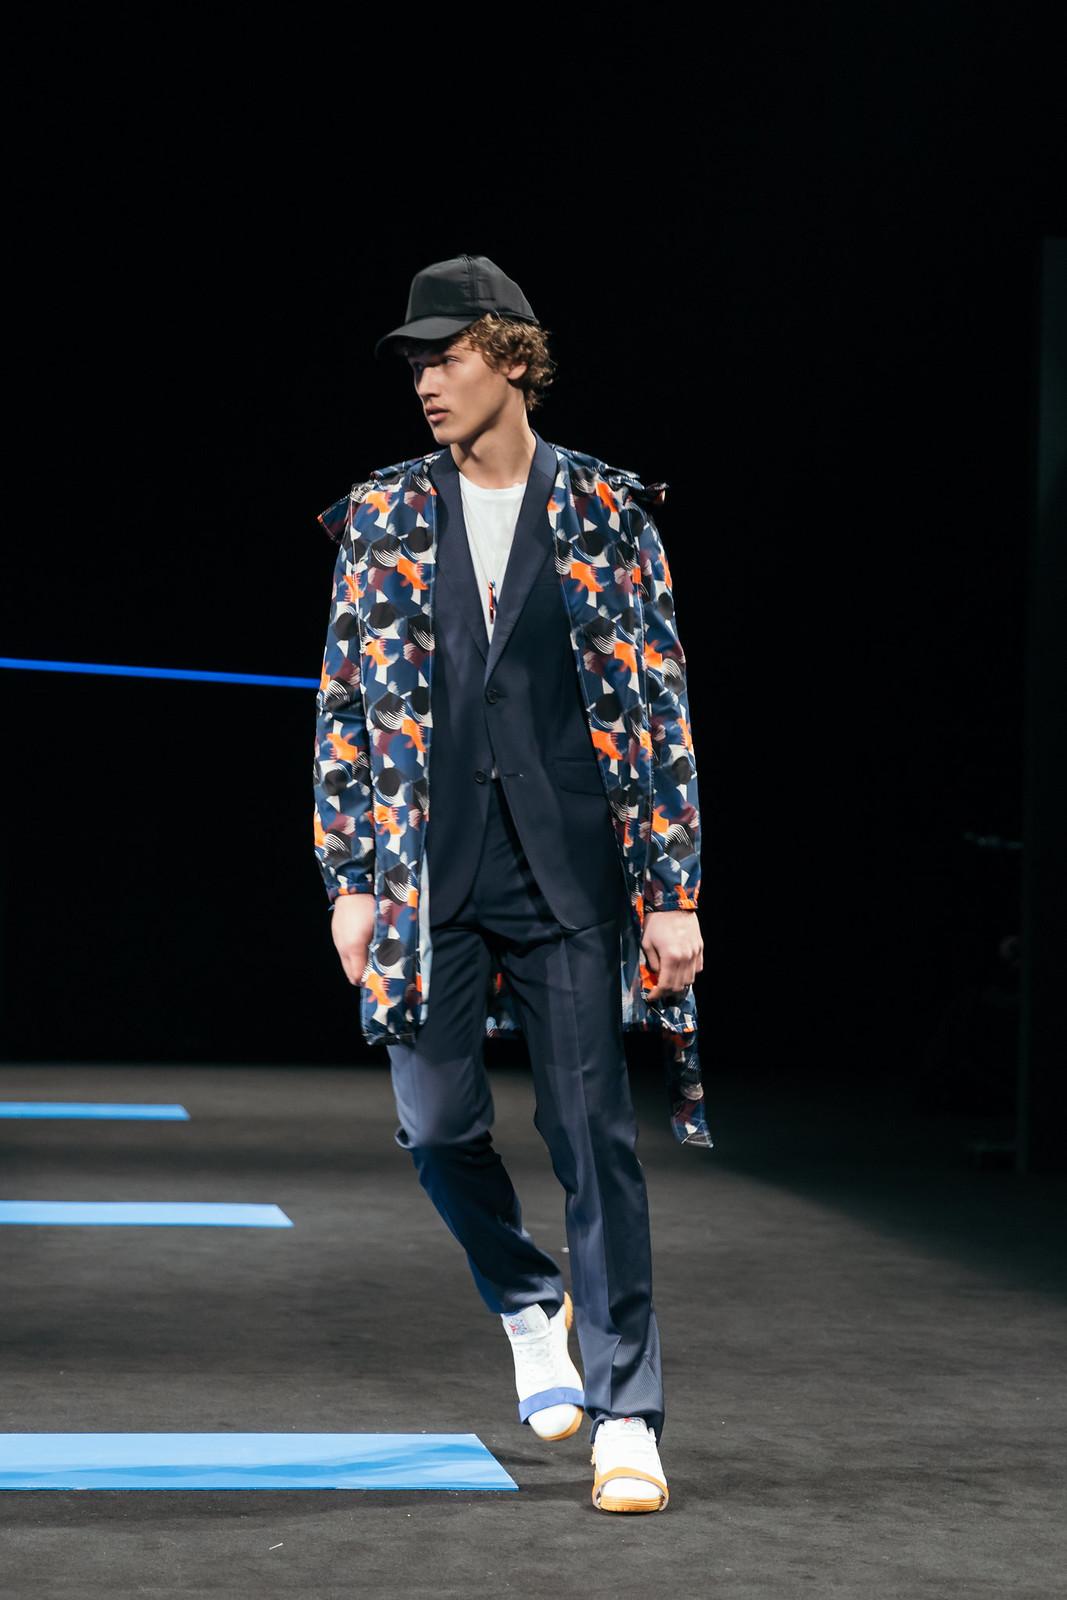 Jessie Chanes - Seams for a desire - 080 Bacelona Fashion #080bcnfasion -48